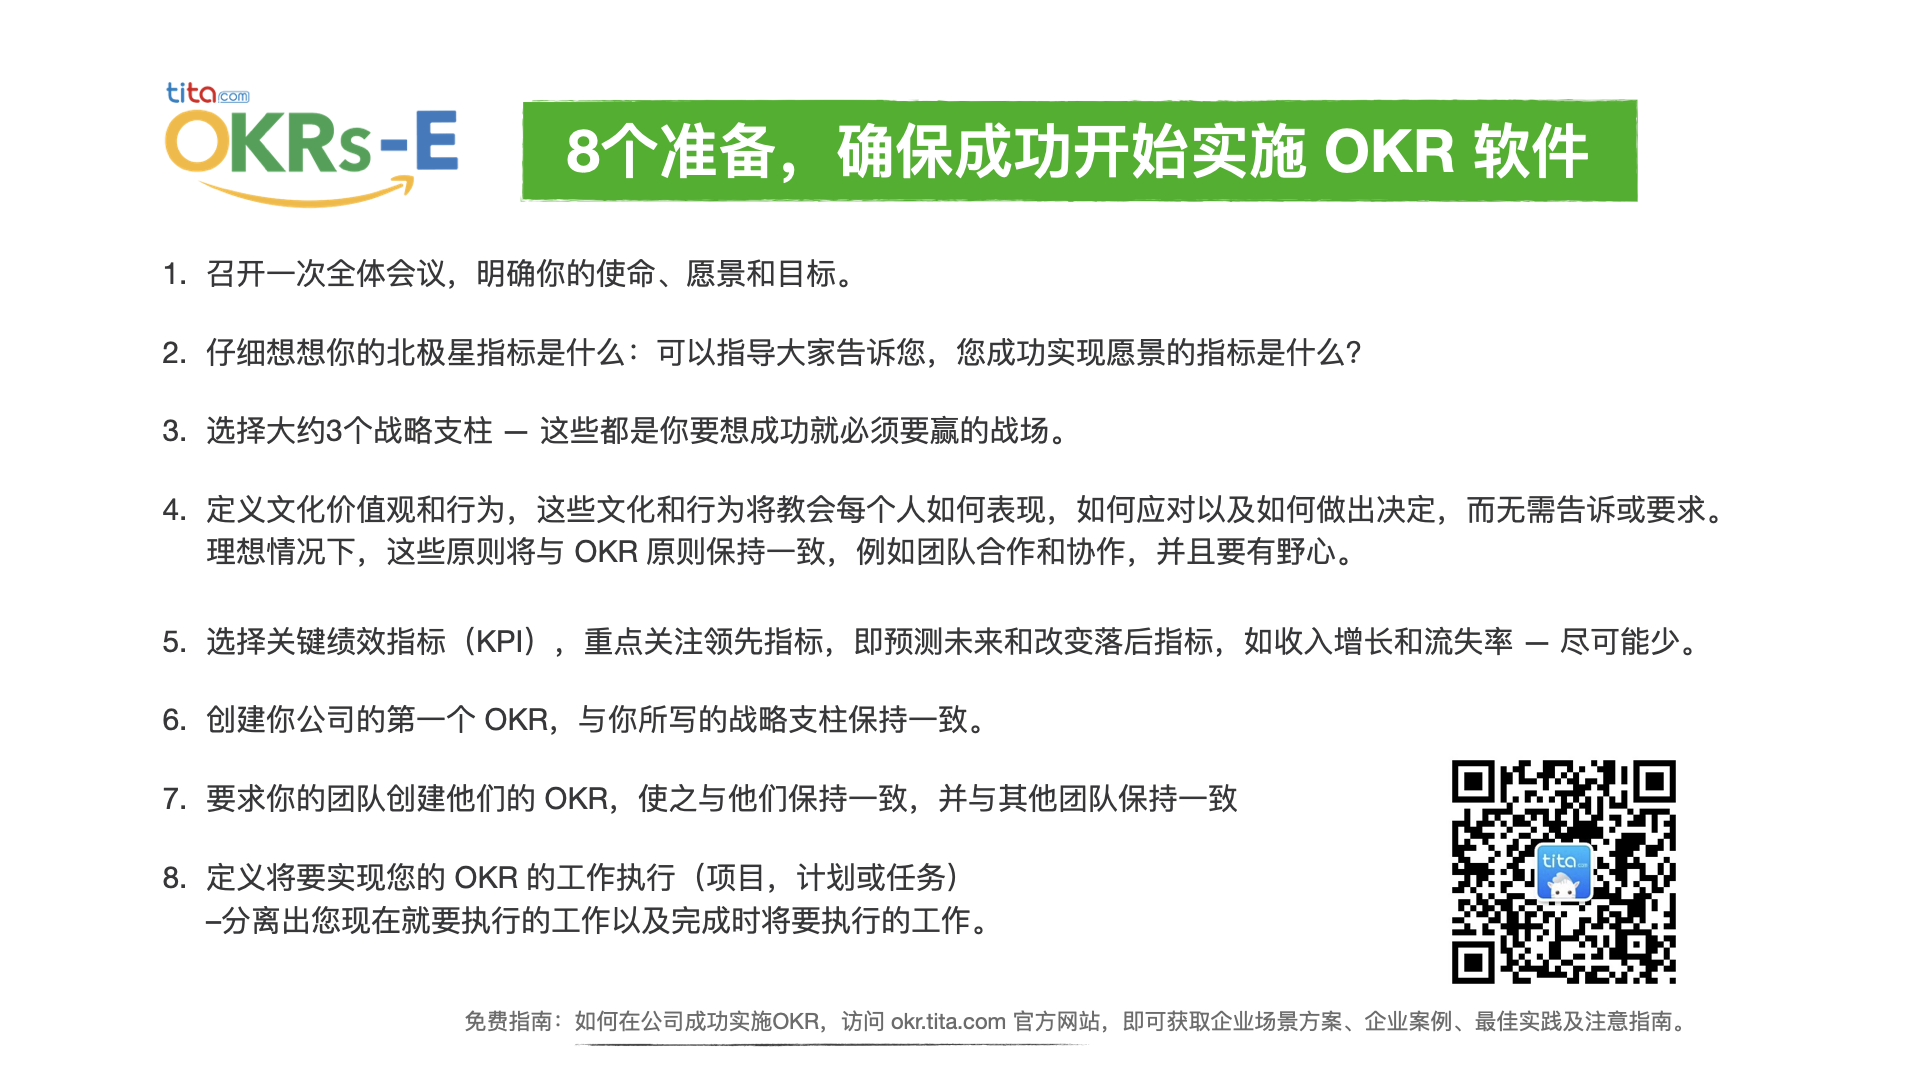 OKR 推进初始期中最大难题